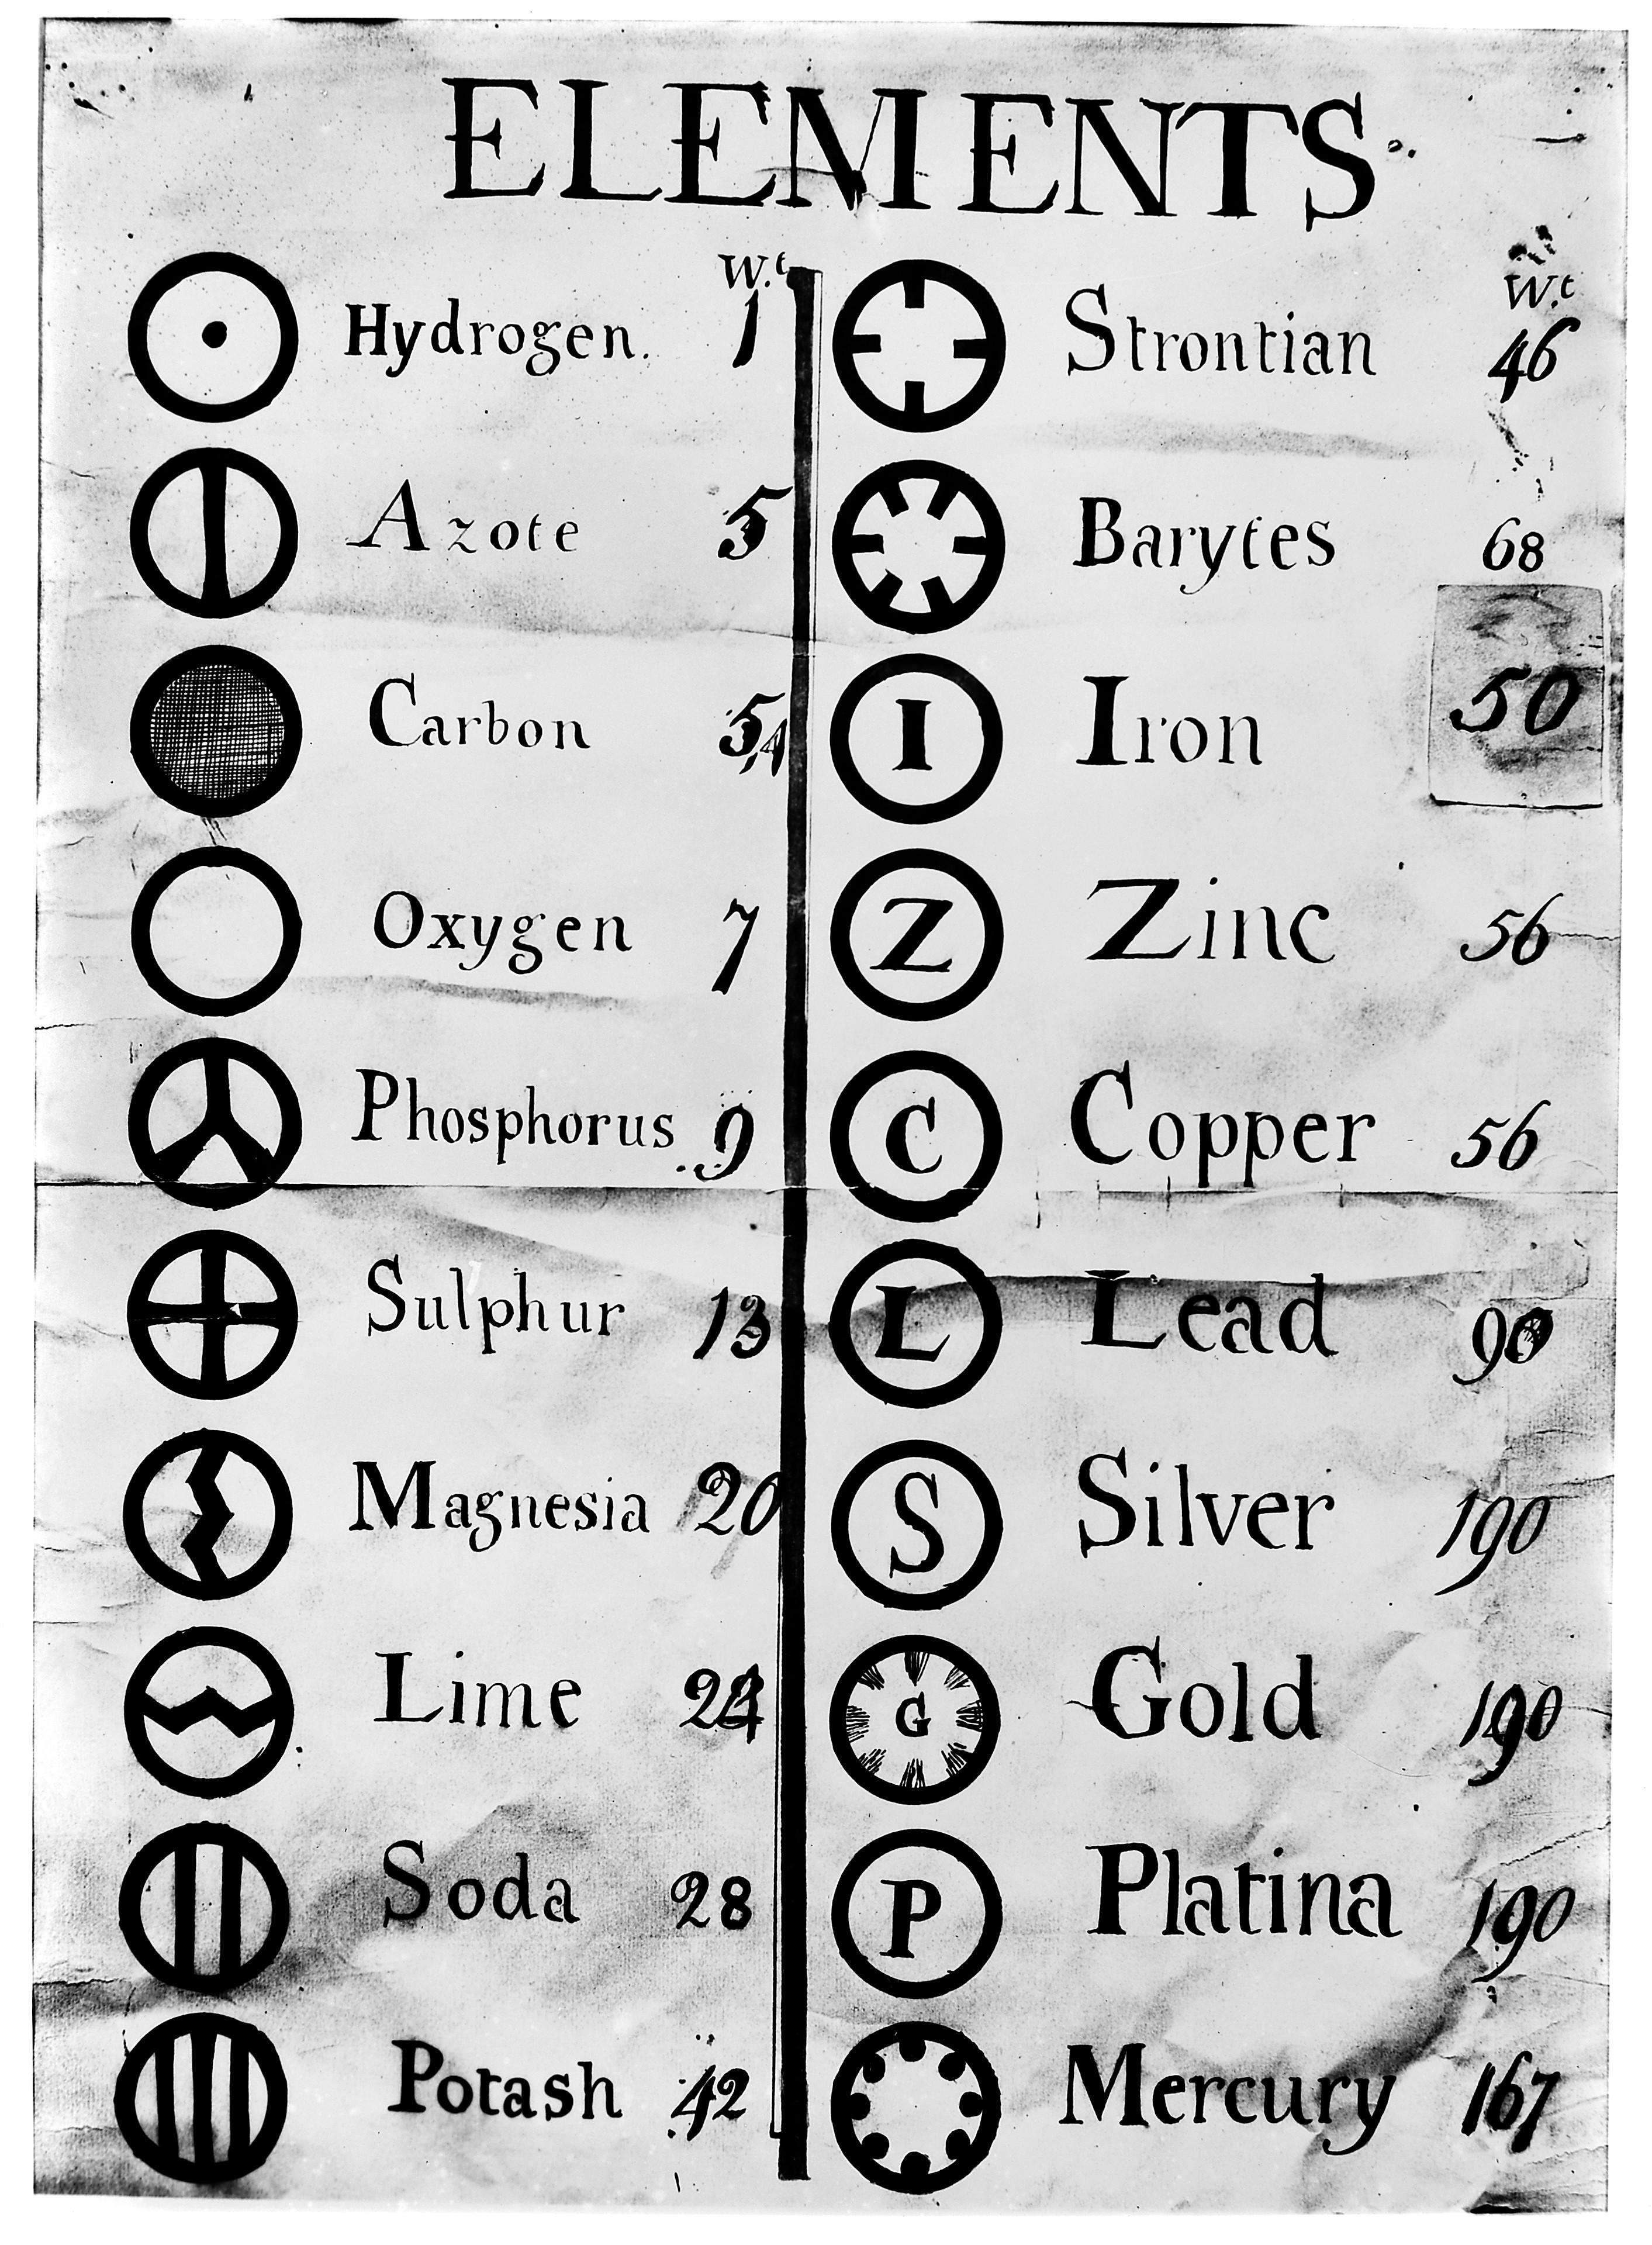 The periodic table wikipedia choice image periodic table images the periodic table wikipedia gallery periodic table images the periodic table wikipedia images periodic table images gamestrikefo Choice Image